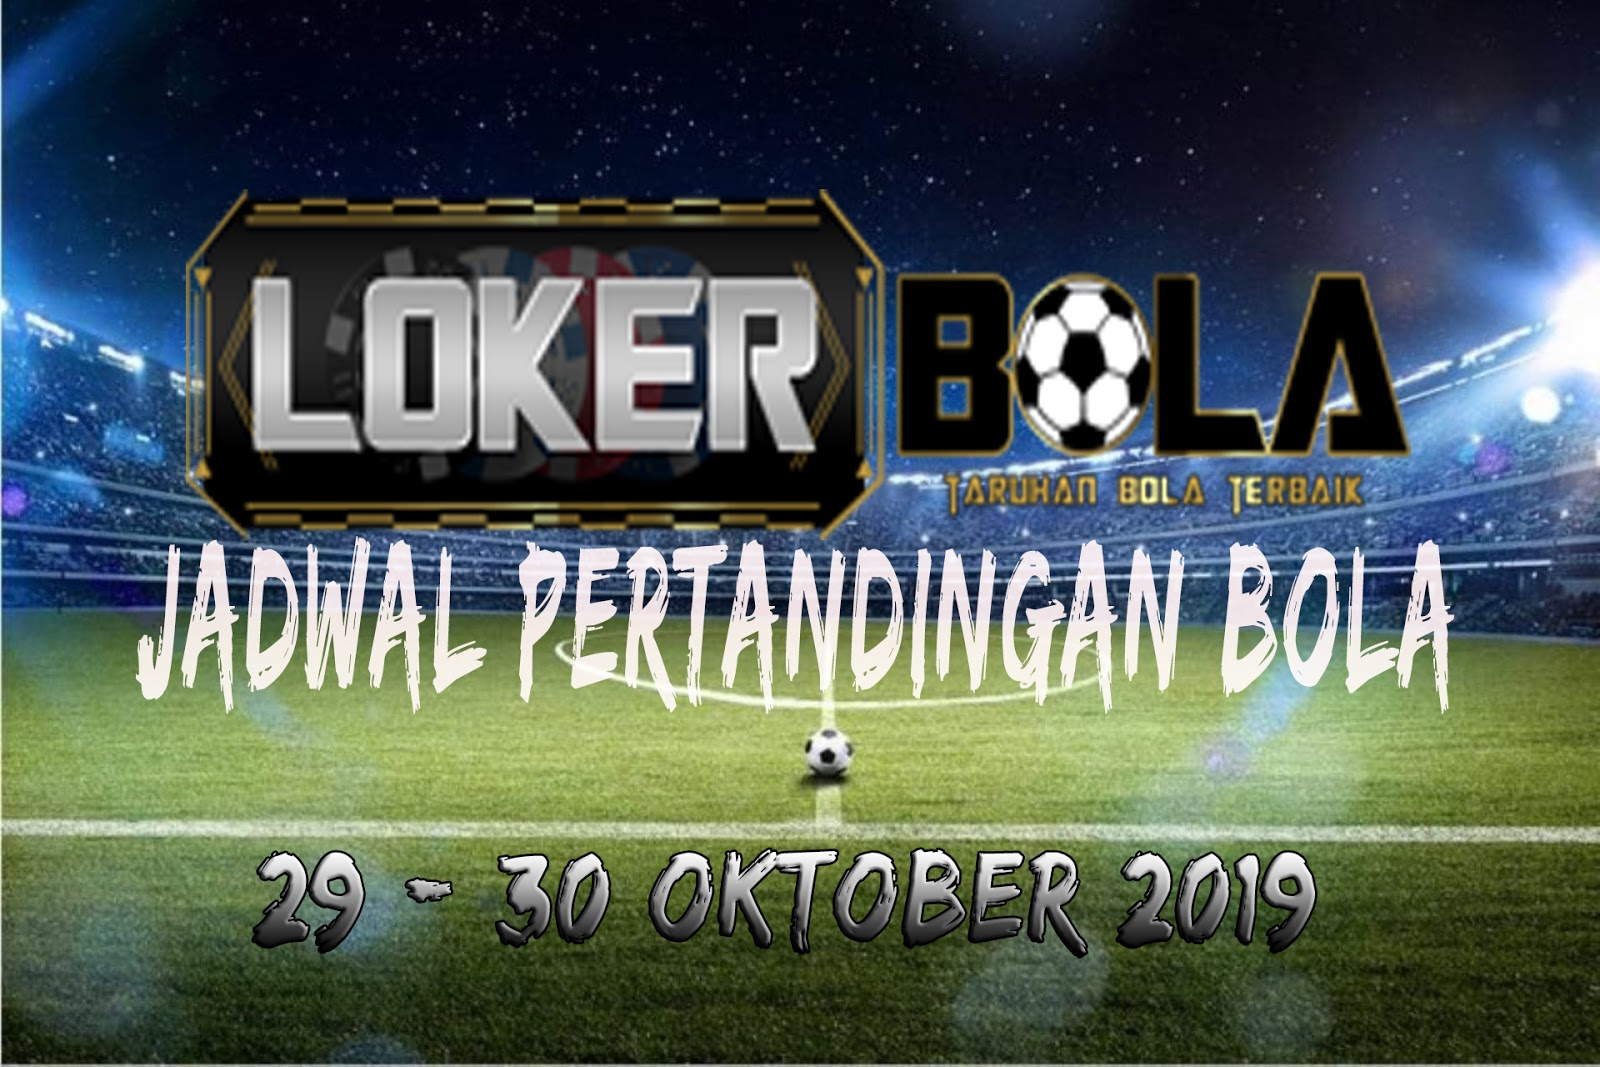 JADWAL PERTANDINGAN BOLA 29 – 30 OKTOBER 2019